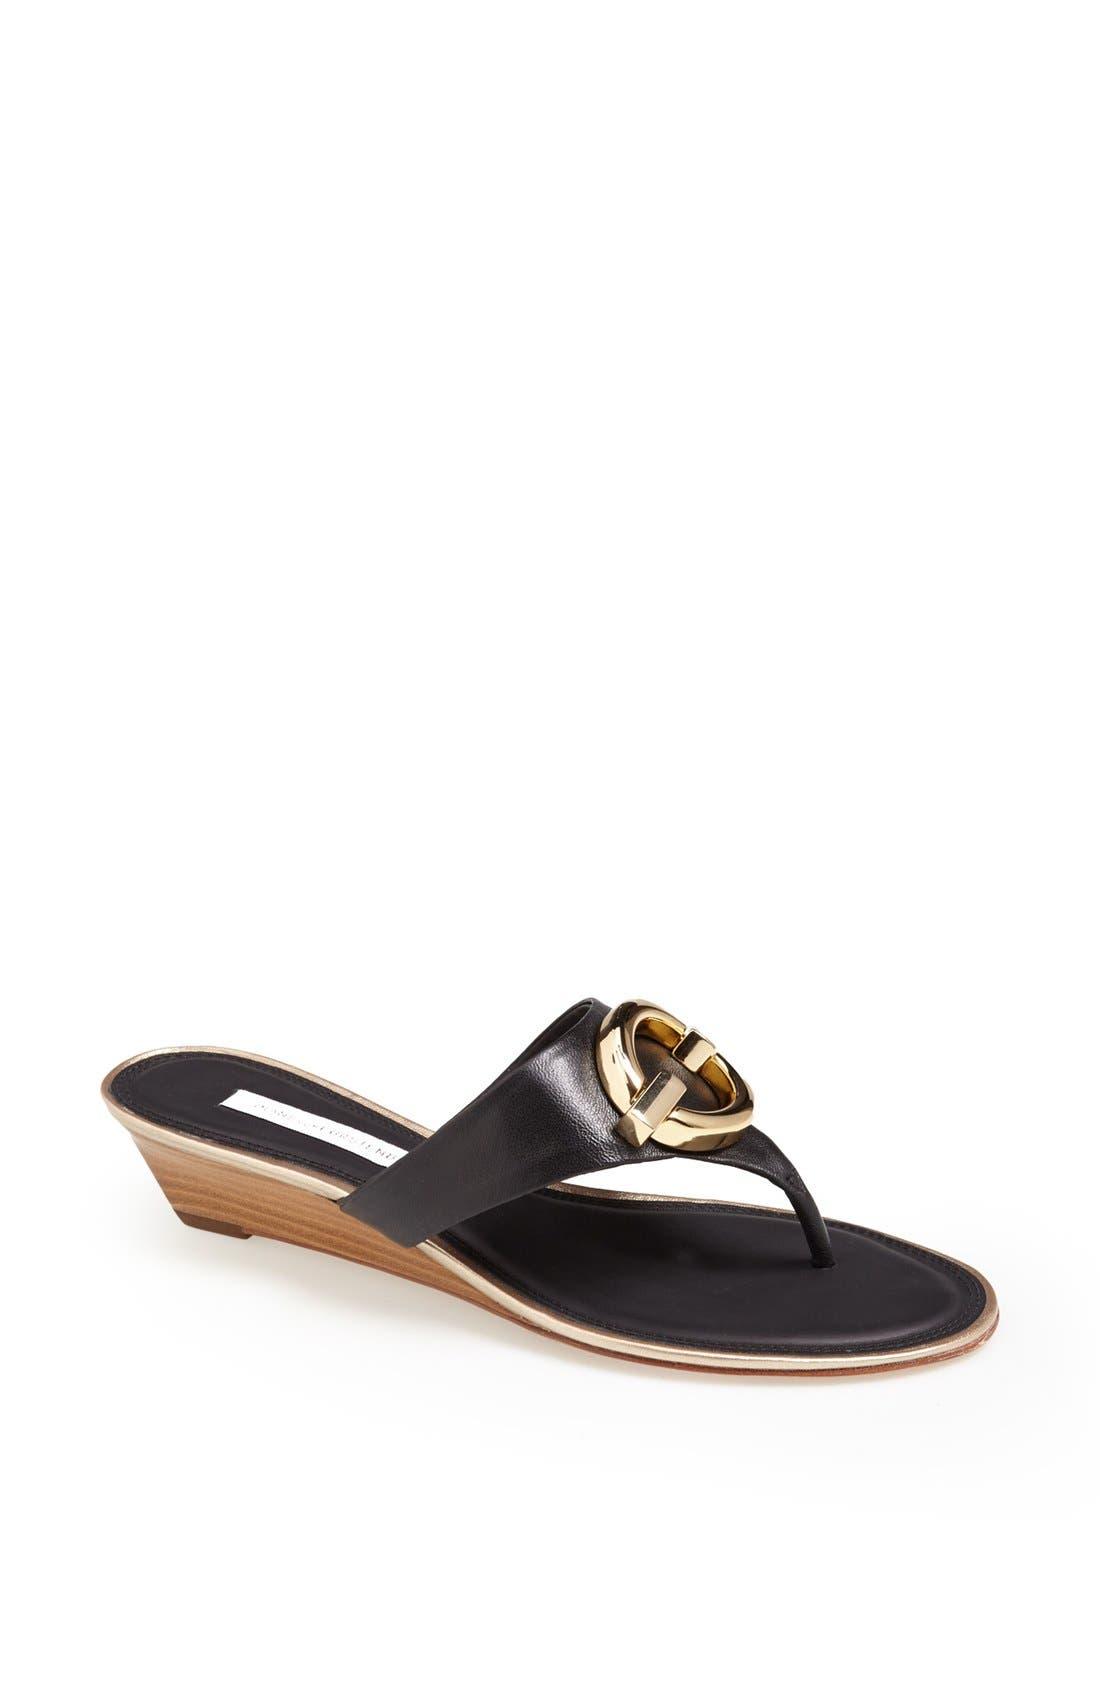 Main Image - Diane von Furstenberg 'Tiles' Leather Sandal